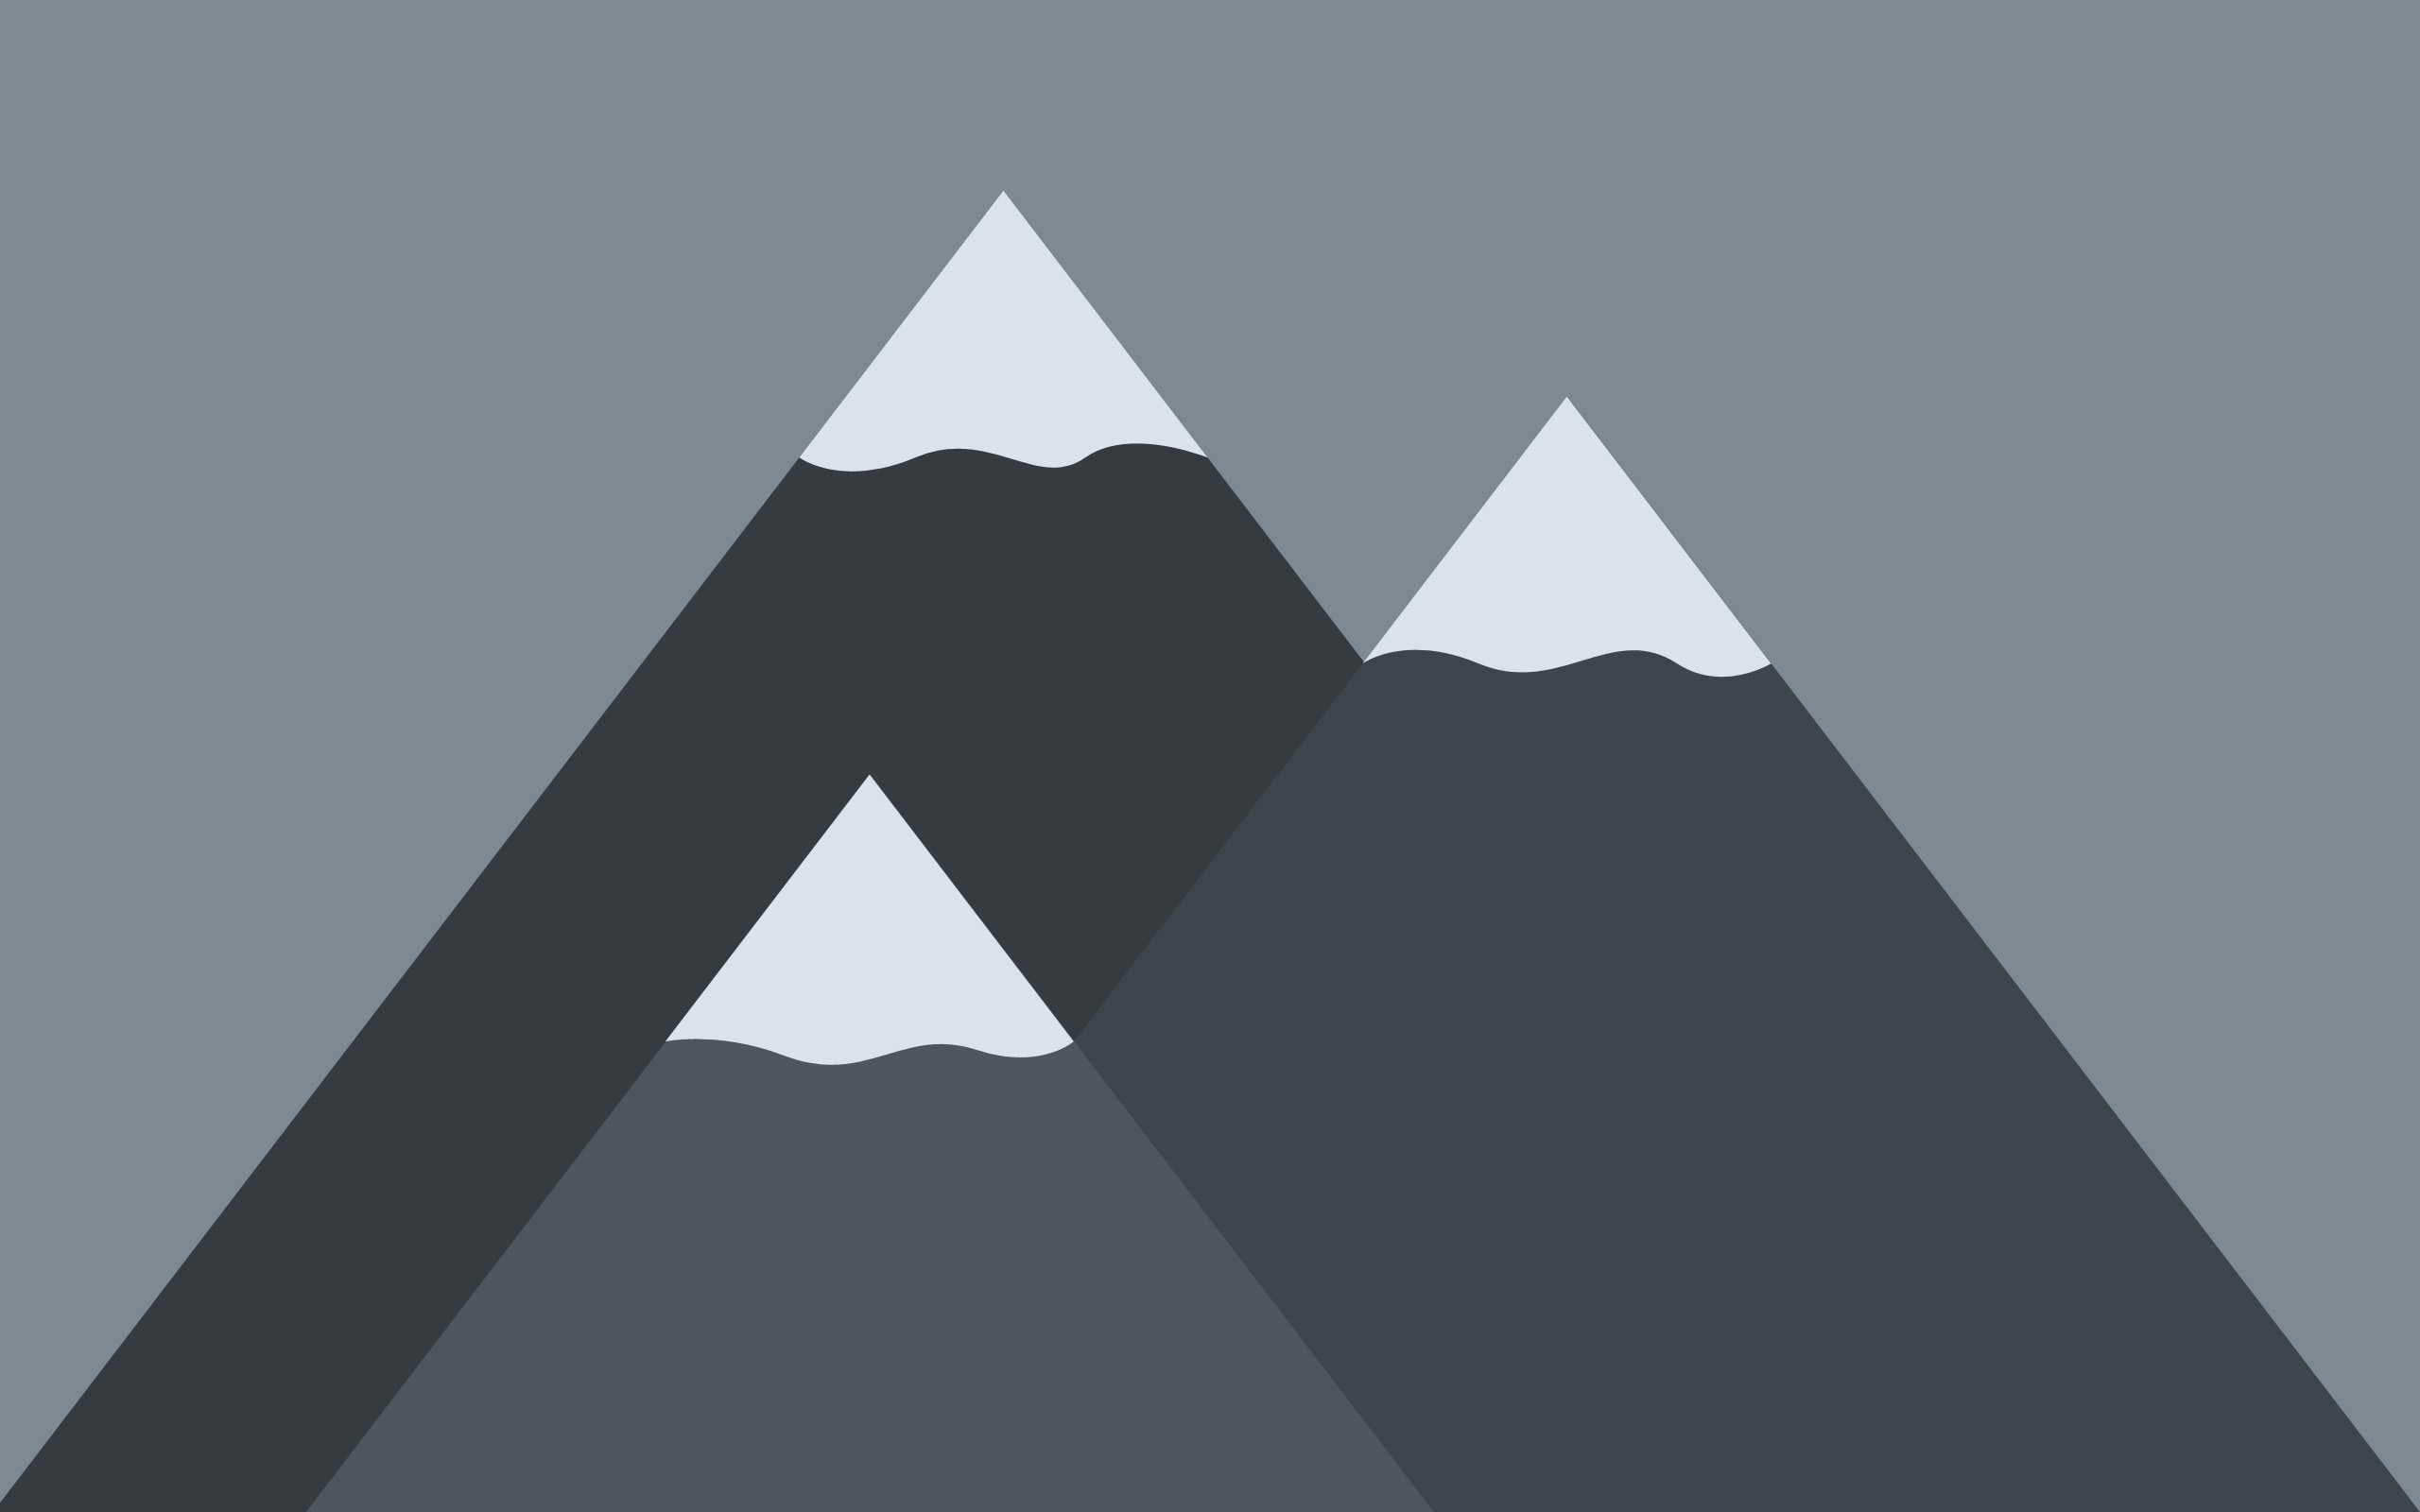 Great Wallpaper Mountain Simple - 2560x1600  Snapshot_752141.org/get/57197/2560x1600